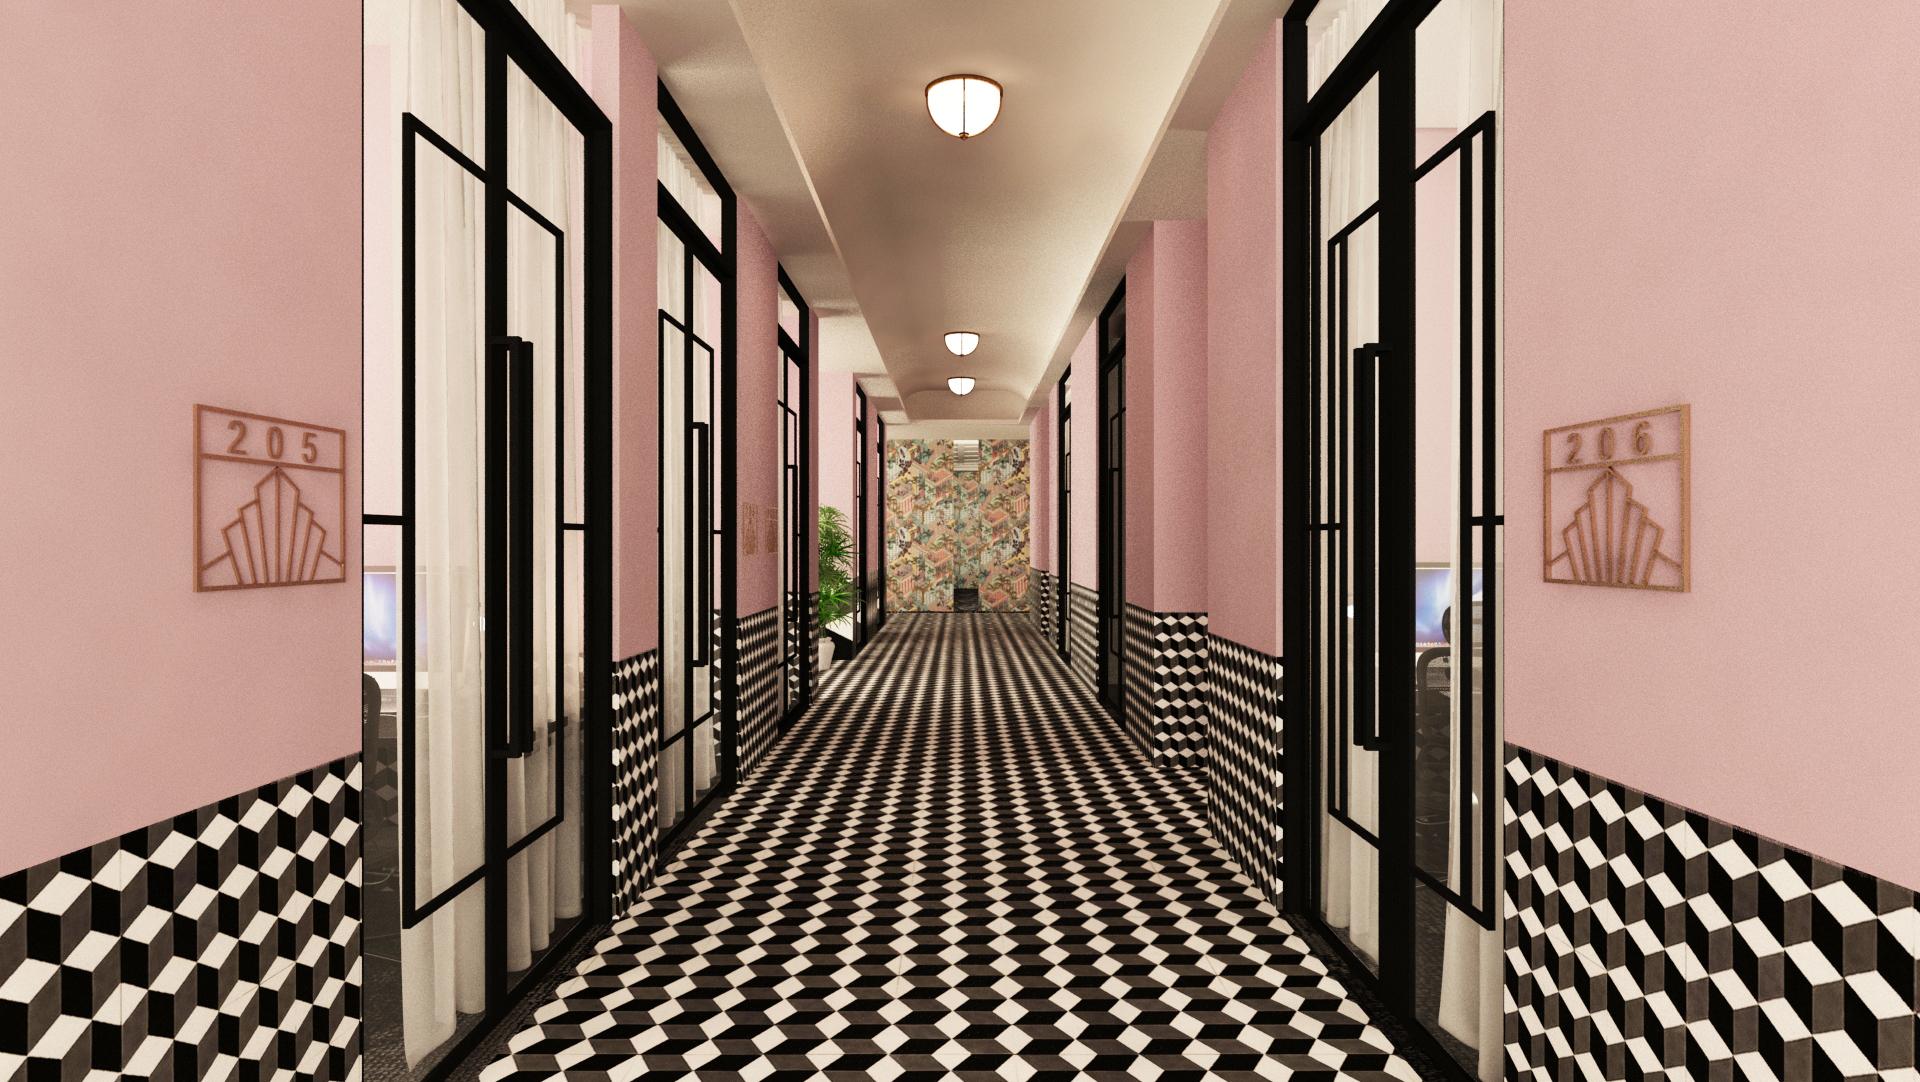 12_Corridor.jpg